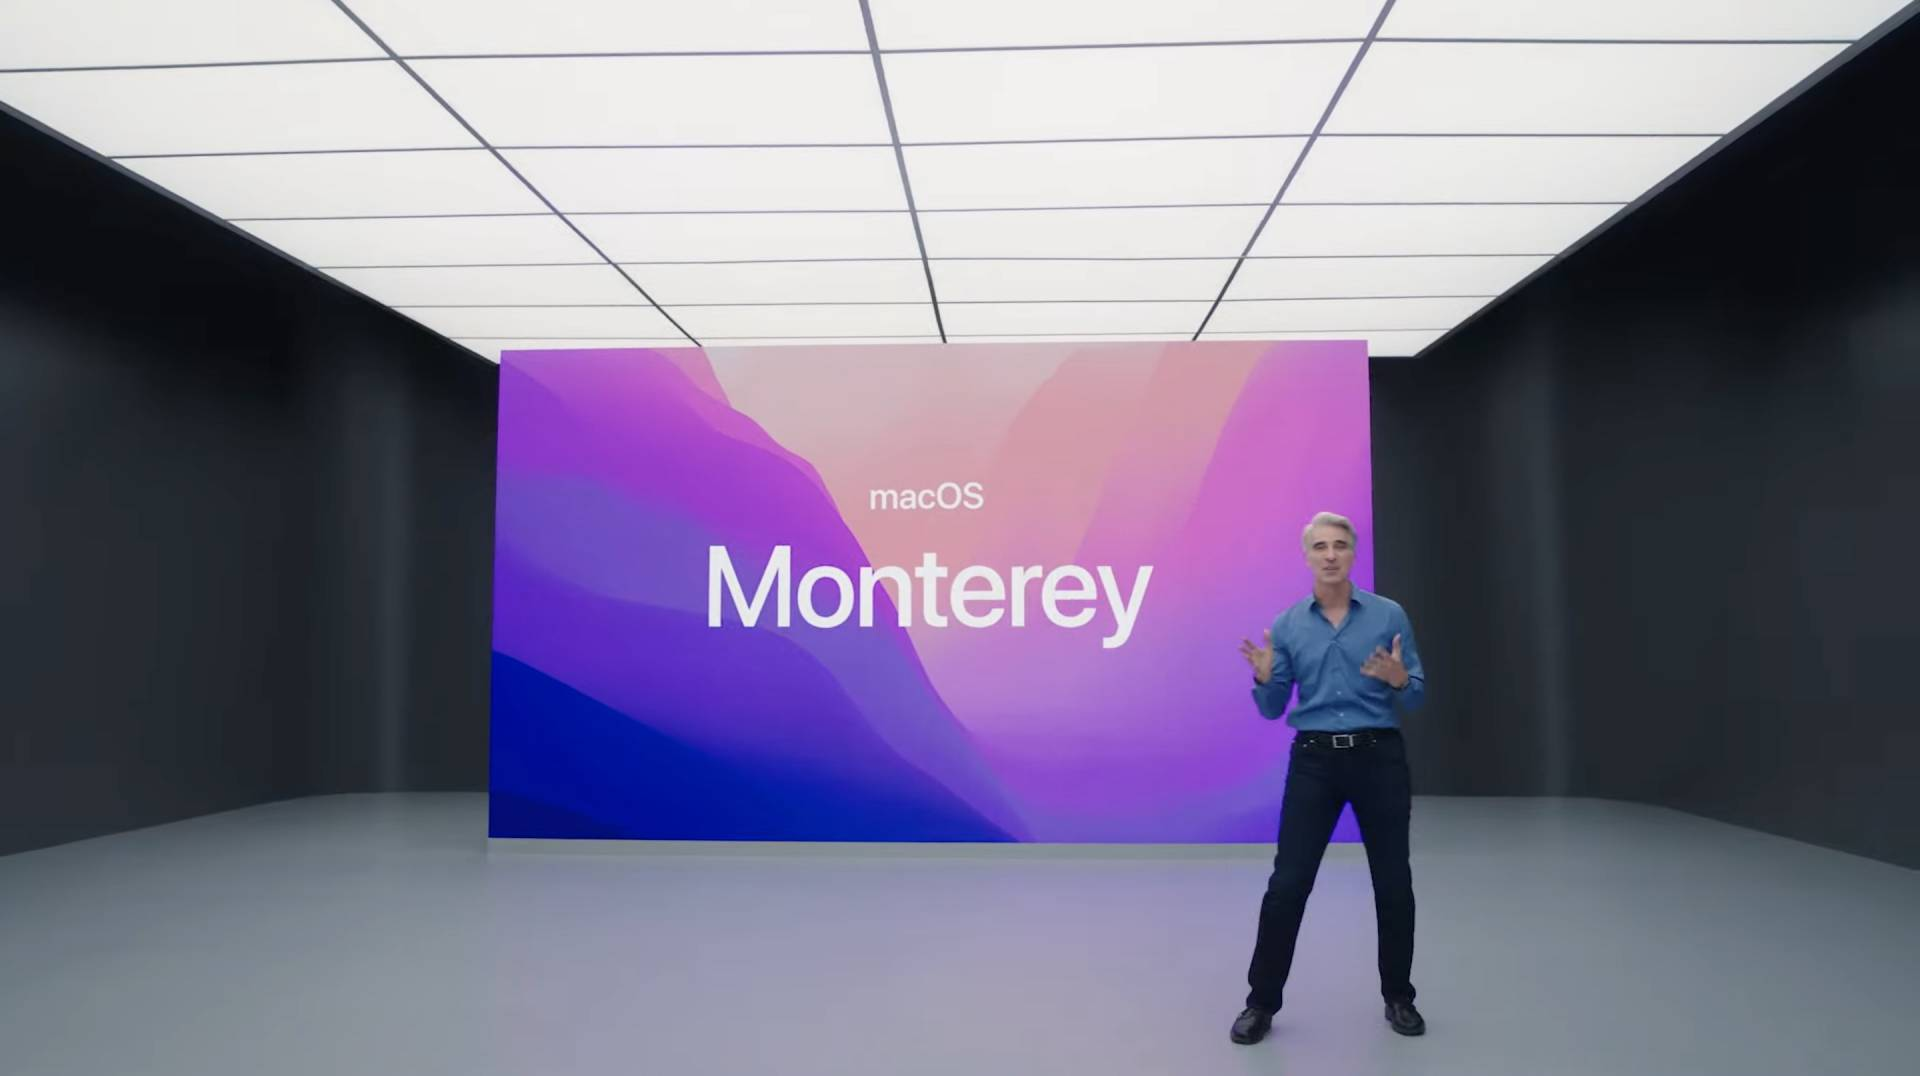 Novinky na macOS 12 Monterey - WWDC 2021